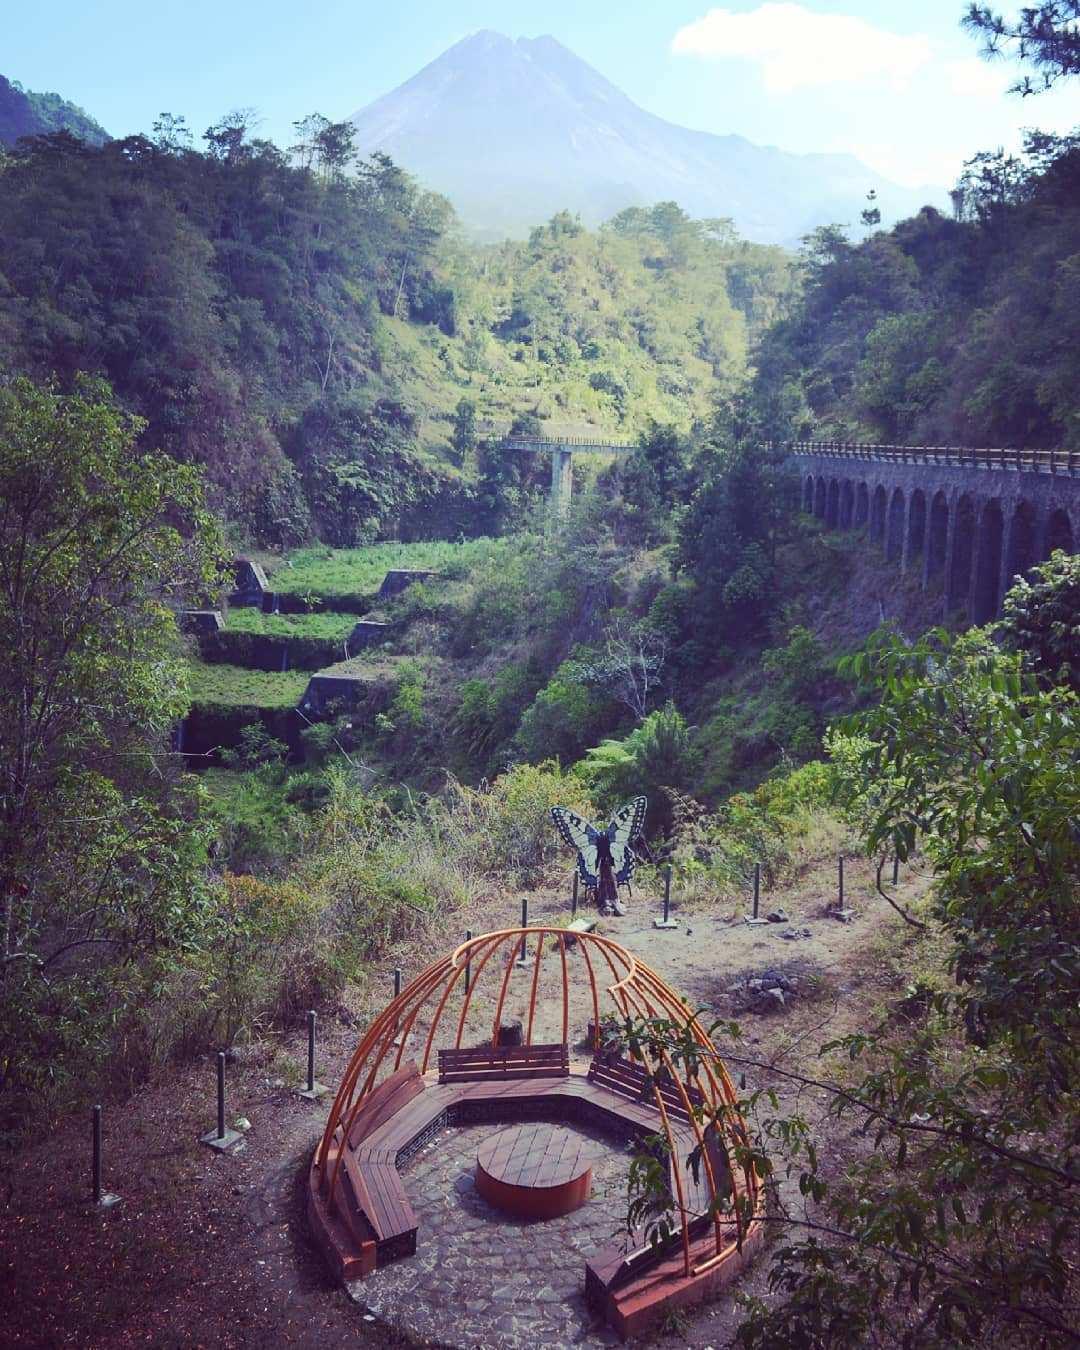 Tempat Duduk Yang Ada di Plunyon Kalikuning Image From @artstonejogja